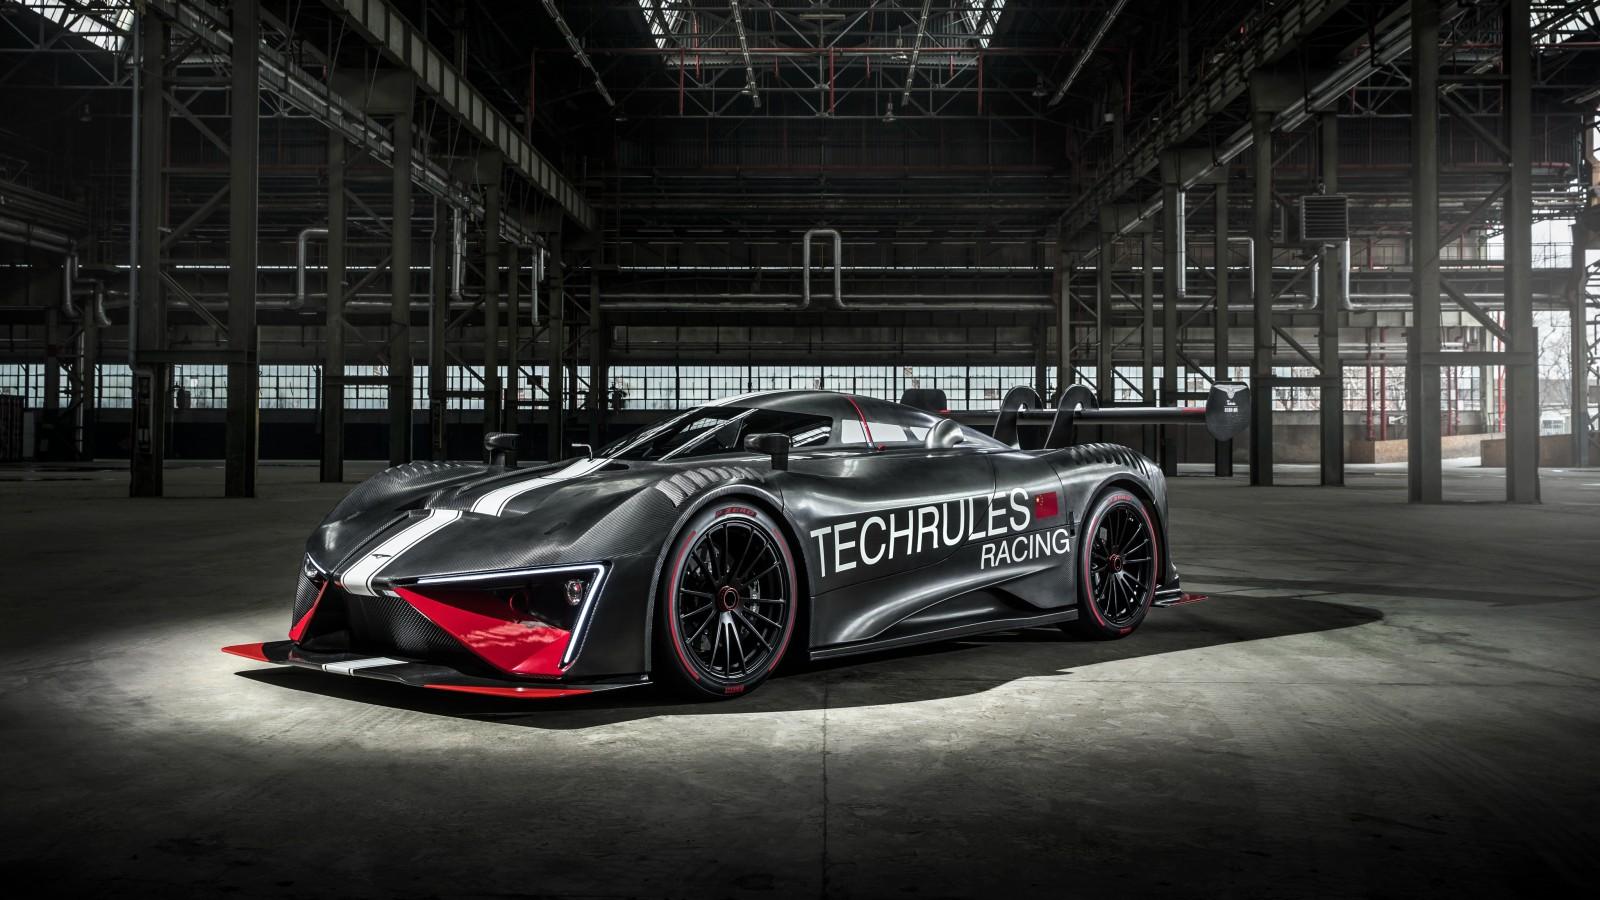 2018 Techrules Ren Rs 4k Wallpaper Hd Car Wallpapers